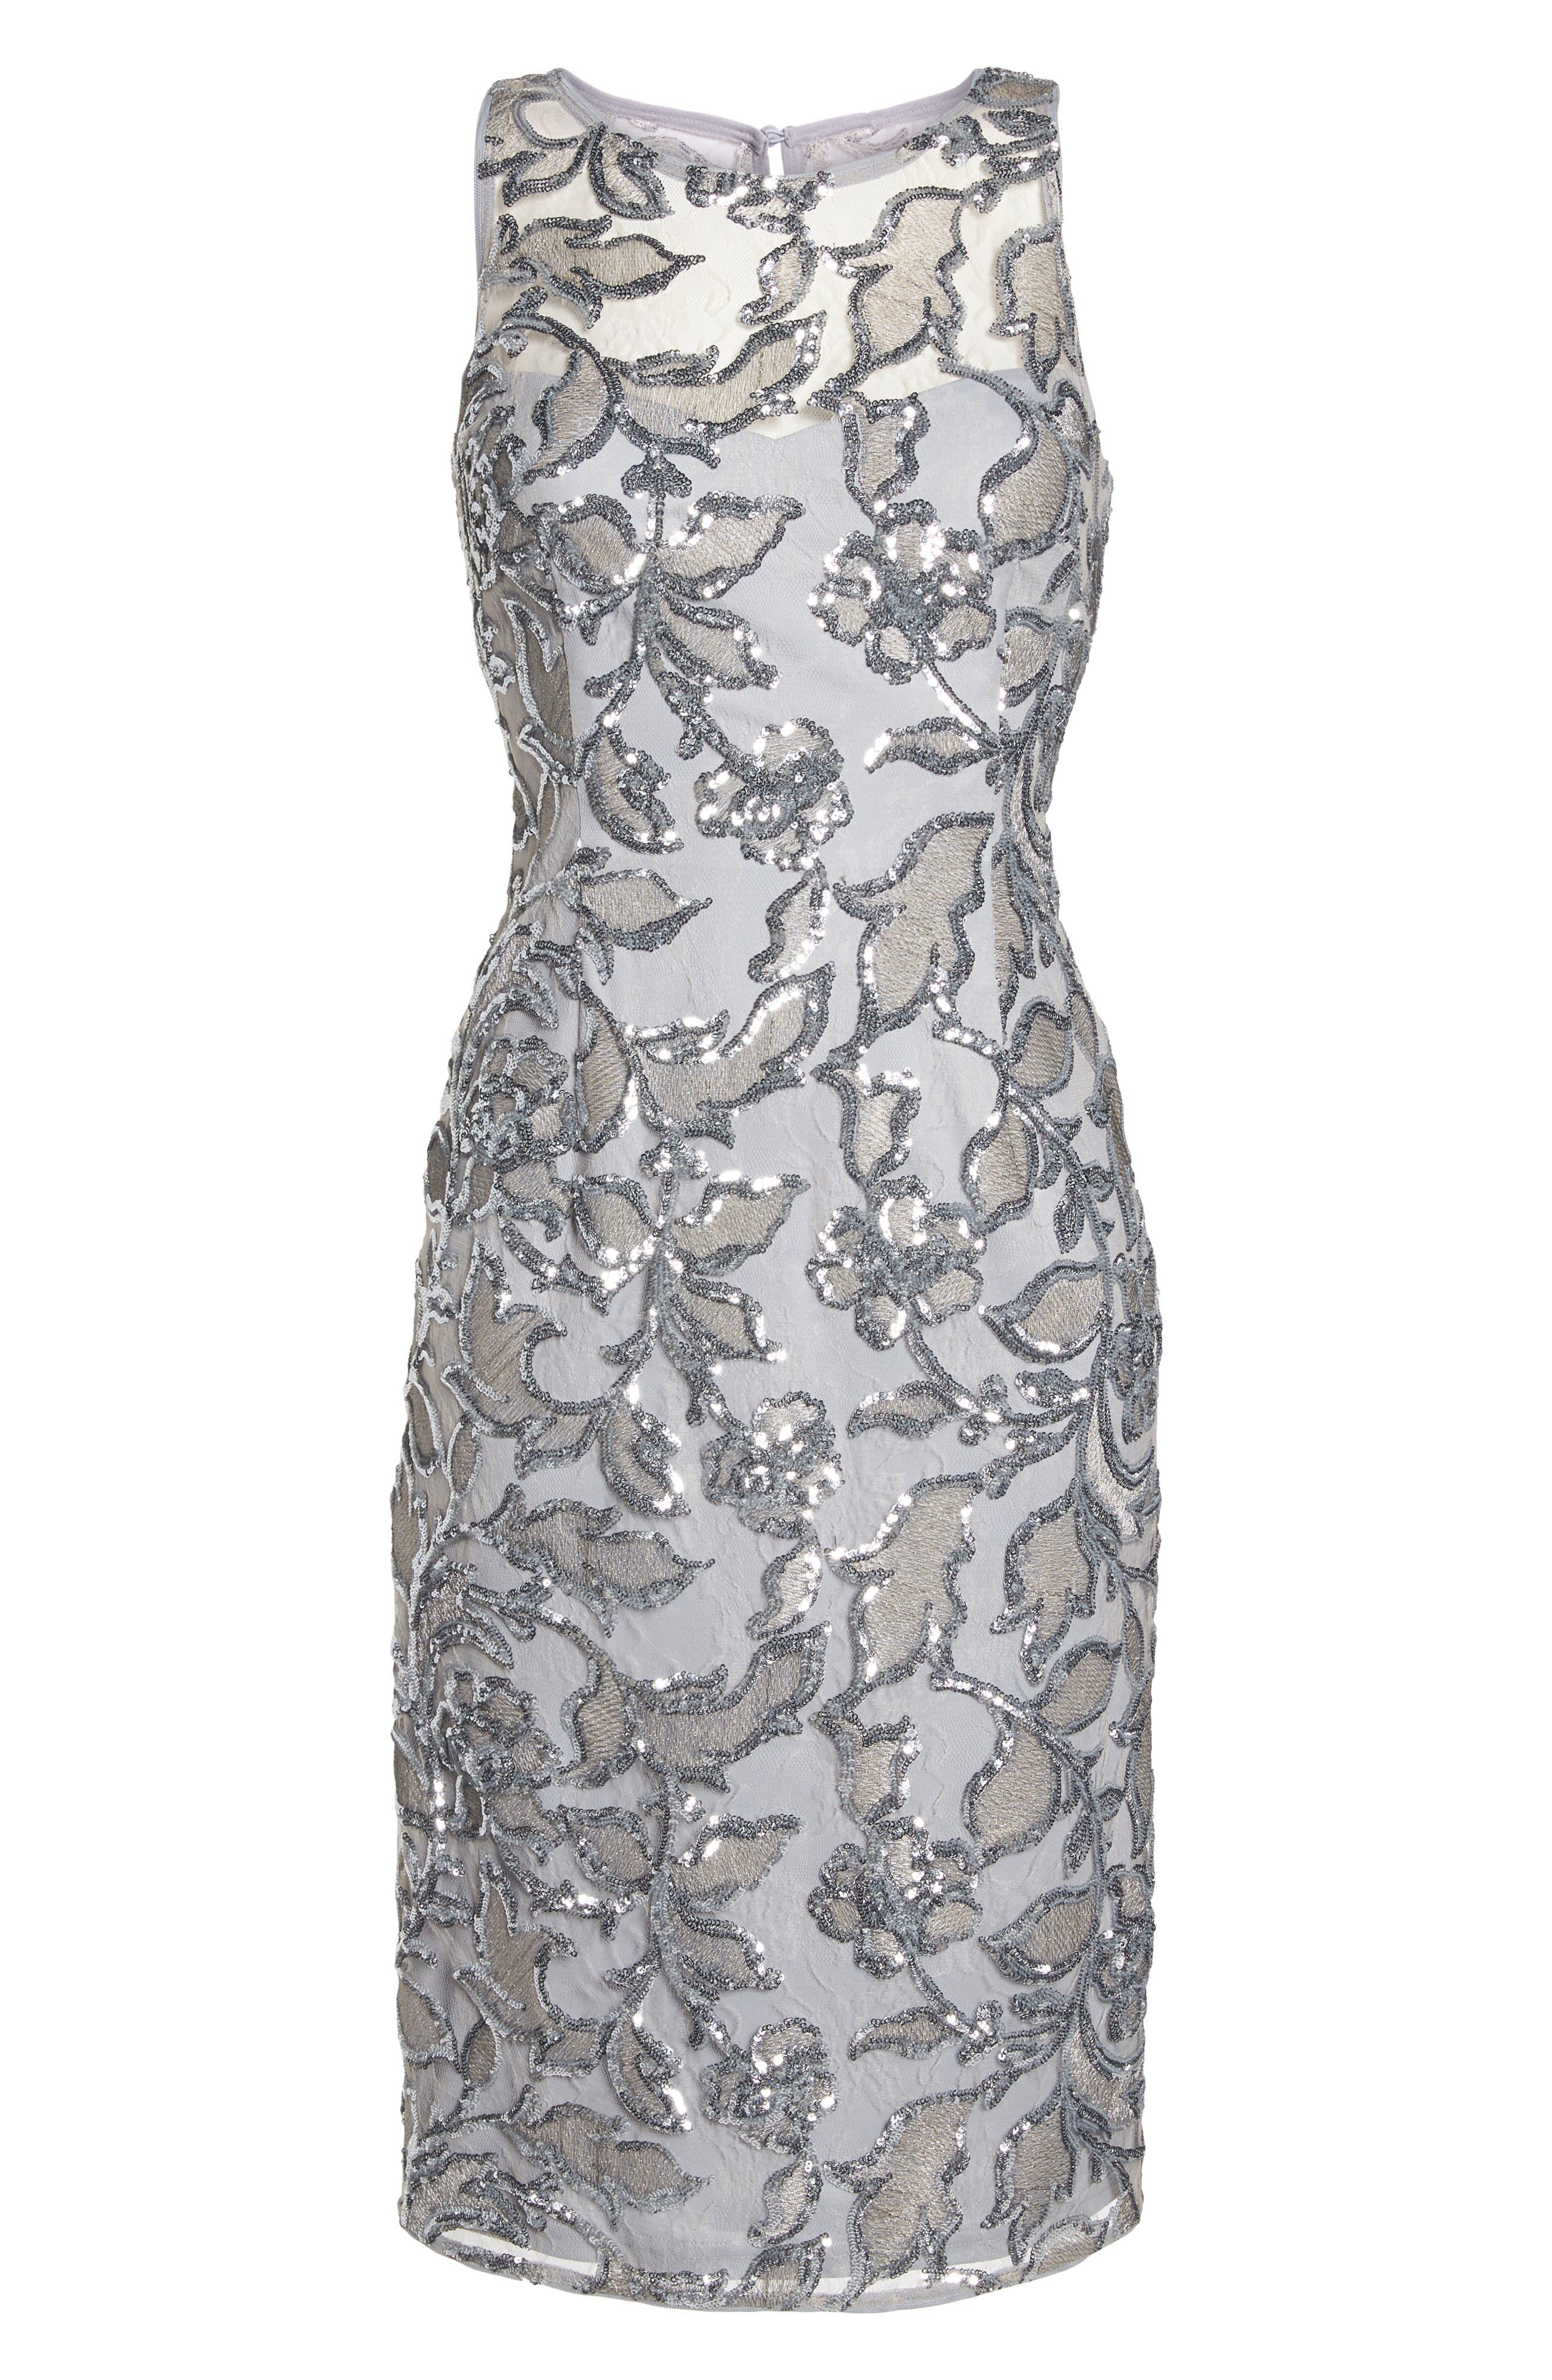 Floral Sequin Sheath Dress,                             Alternate thumbnail 7, color,                             SILVER